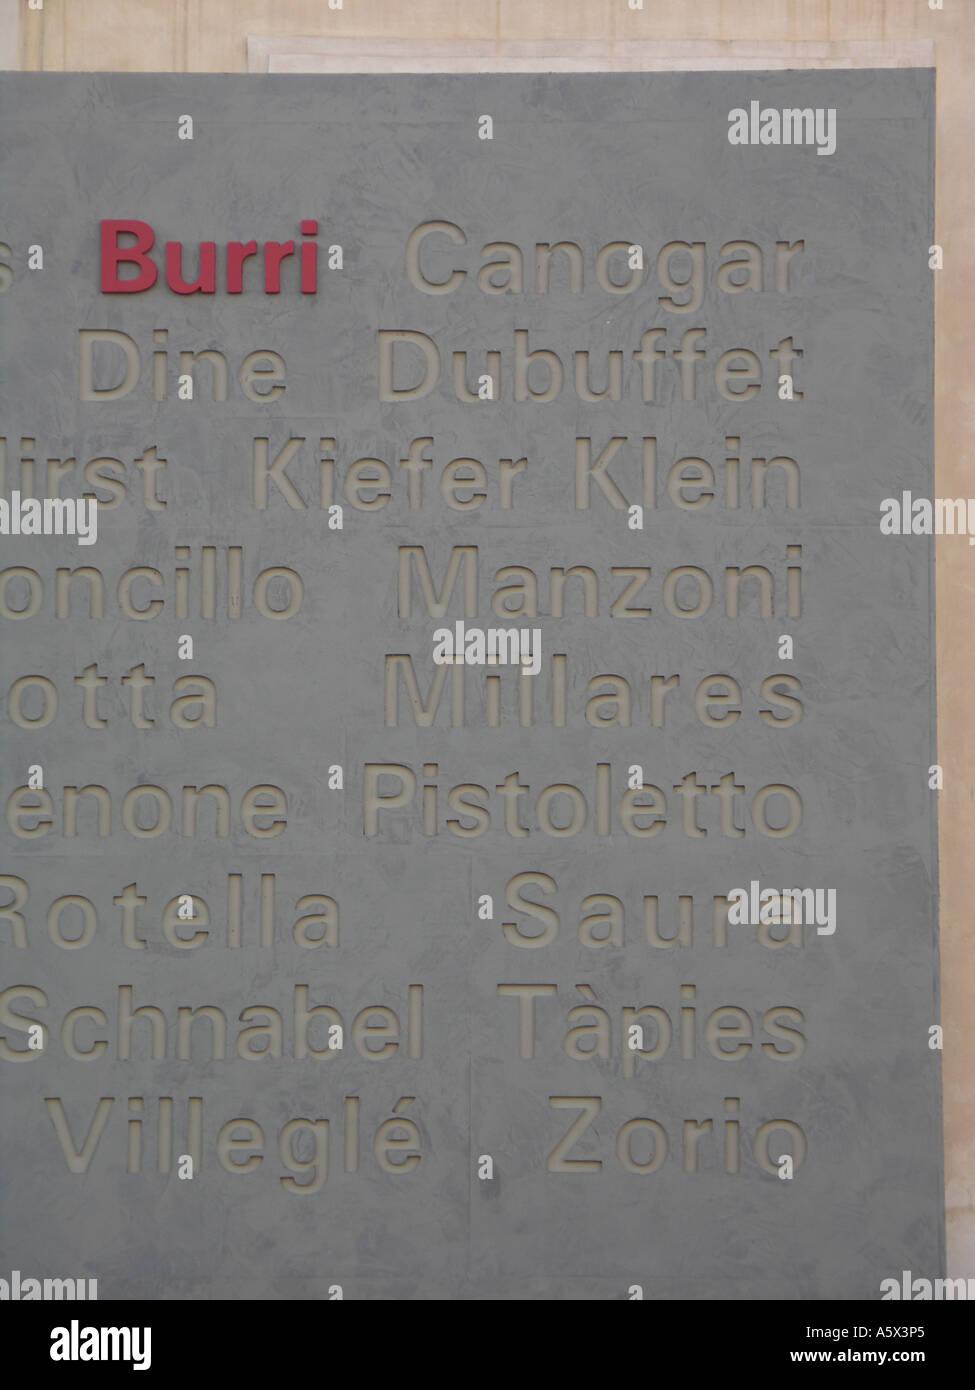 alberto burri exposition in rome - Stock Image